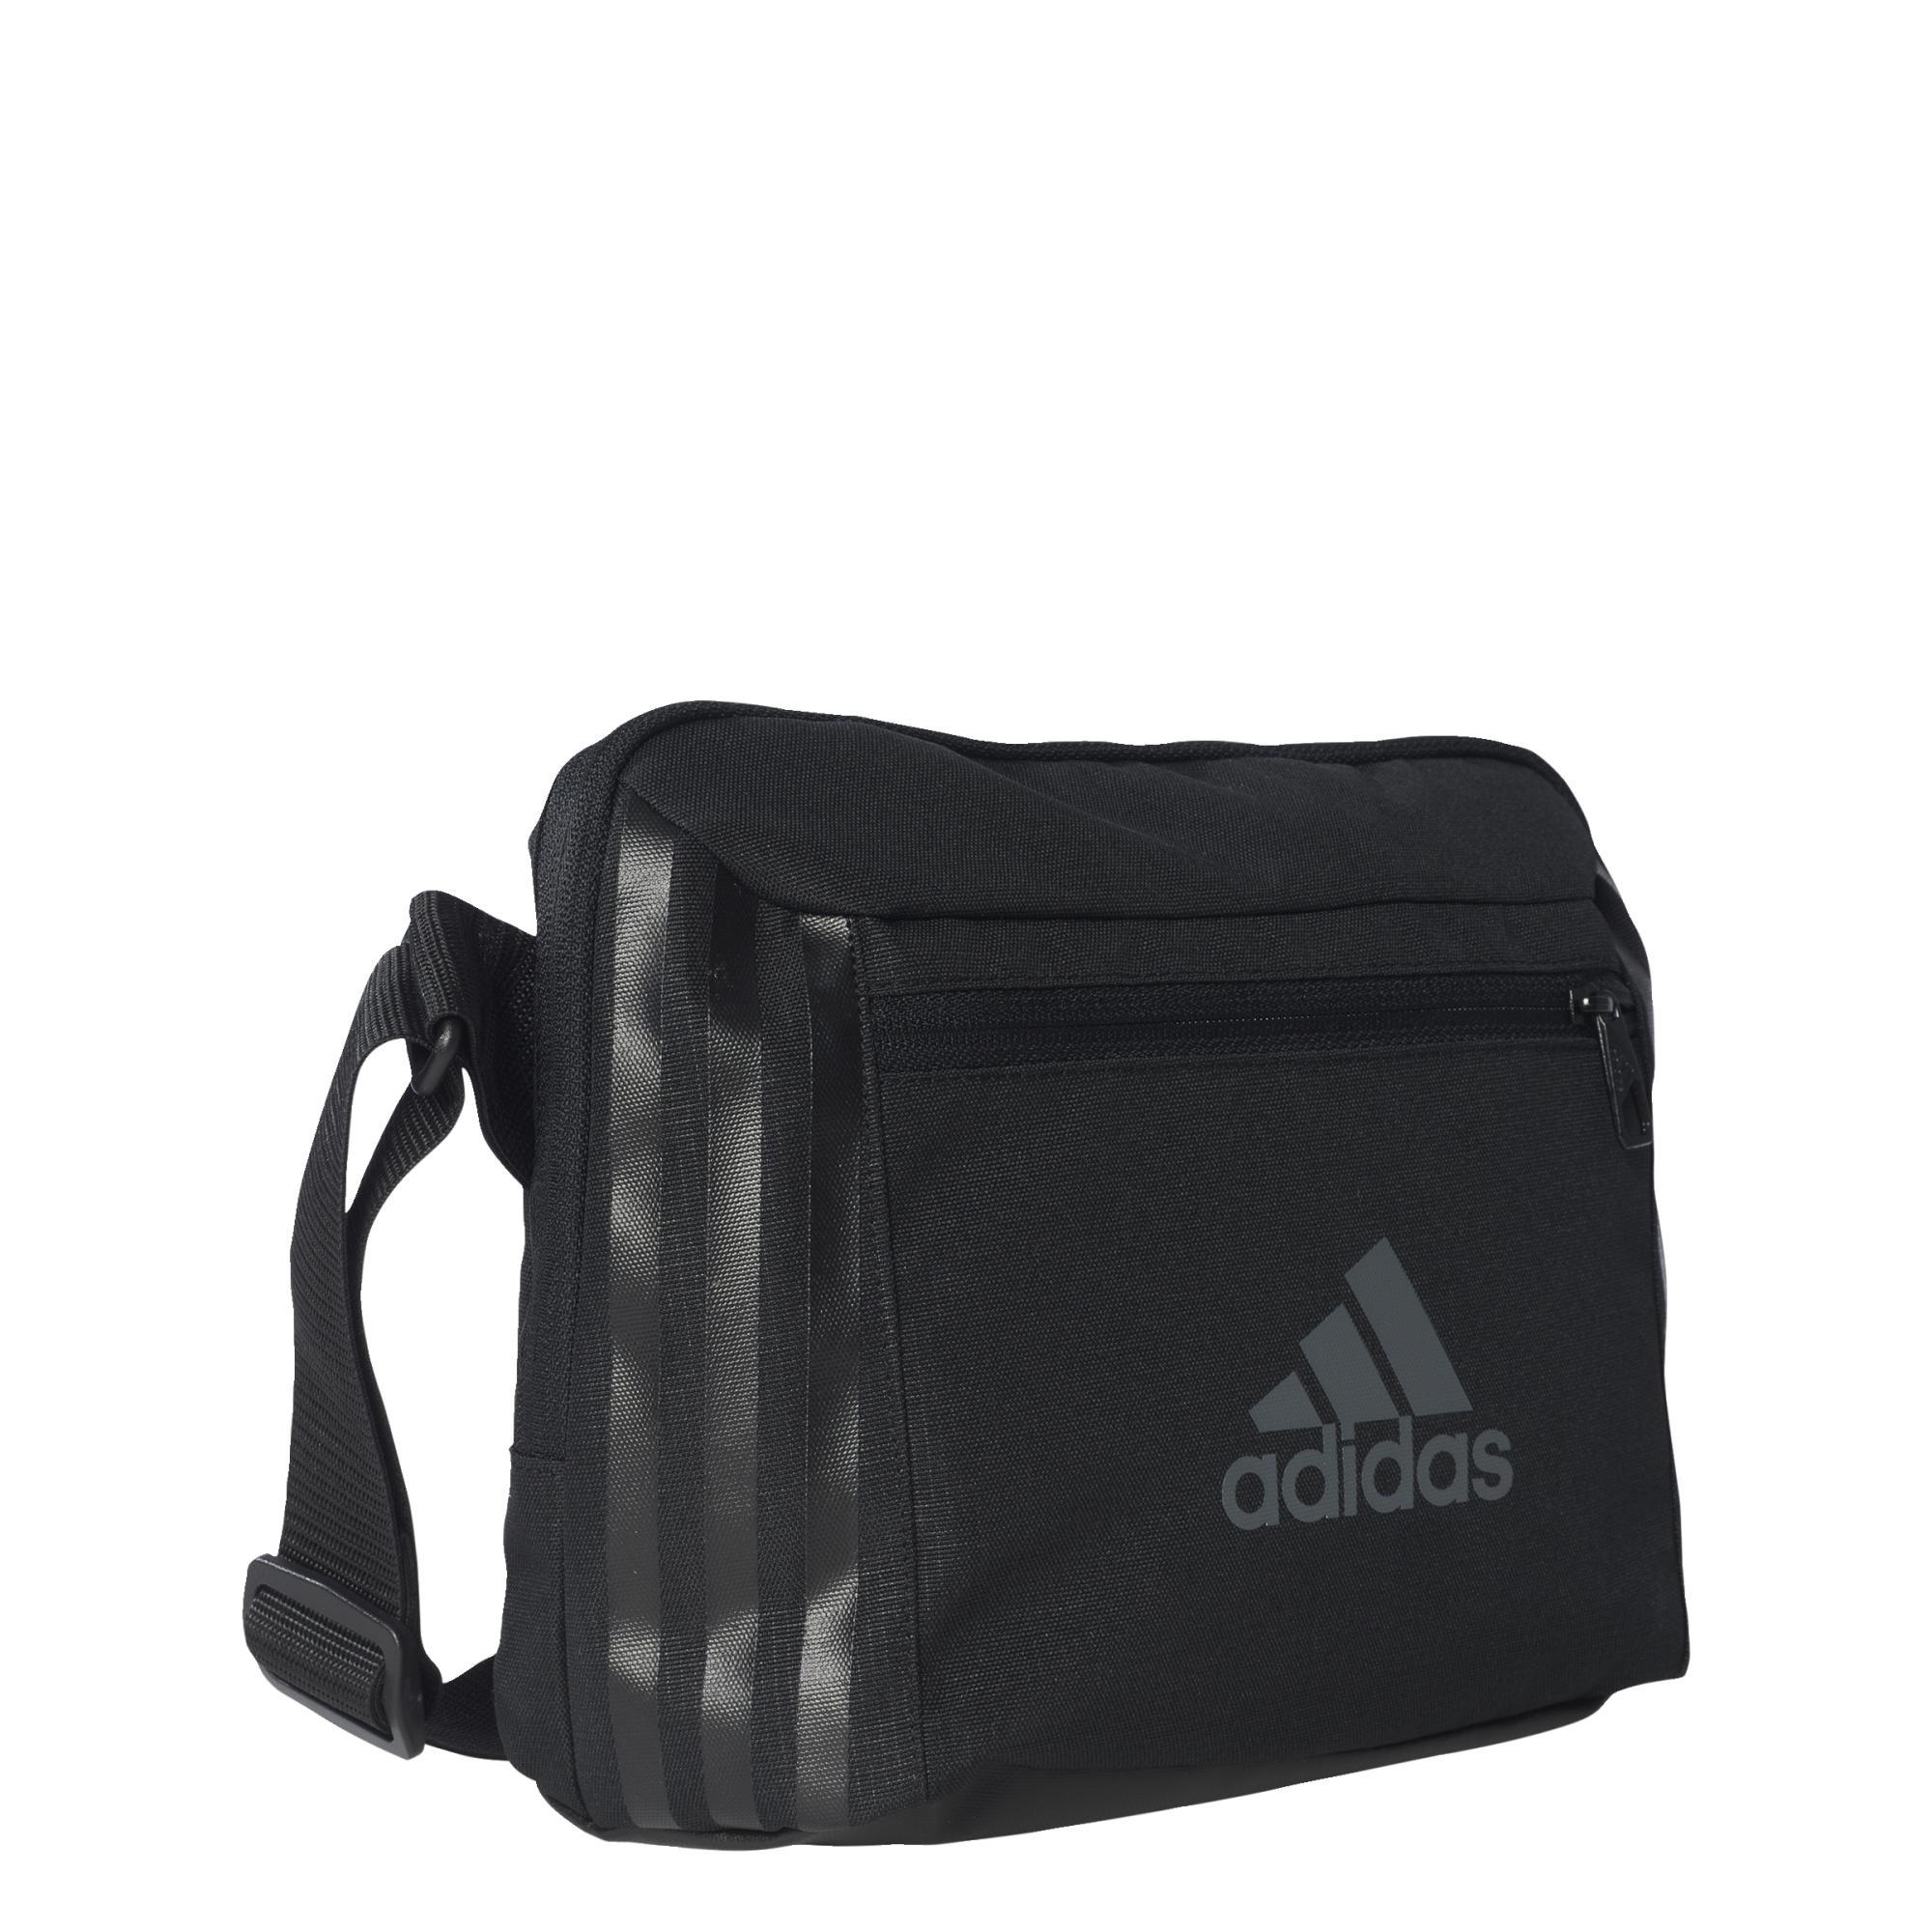 Adidas Organizador Grande Performance 3 franjas (negro) ae5b03762f4ac